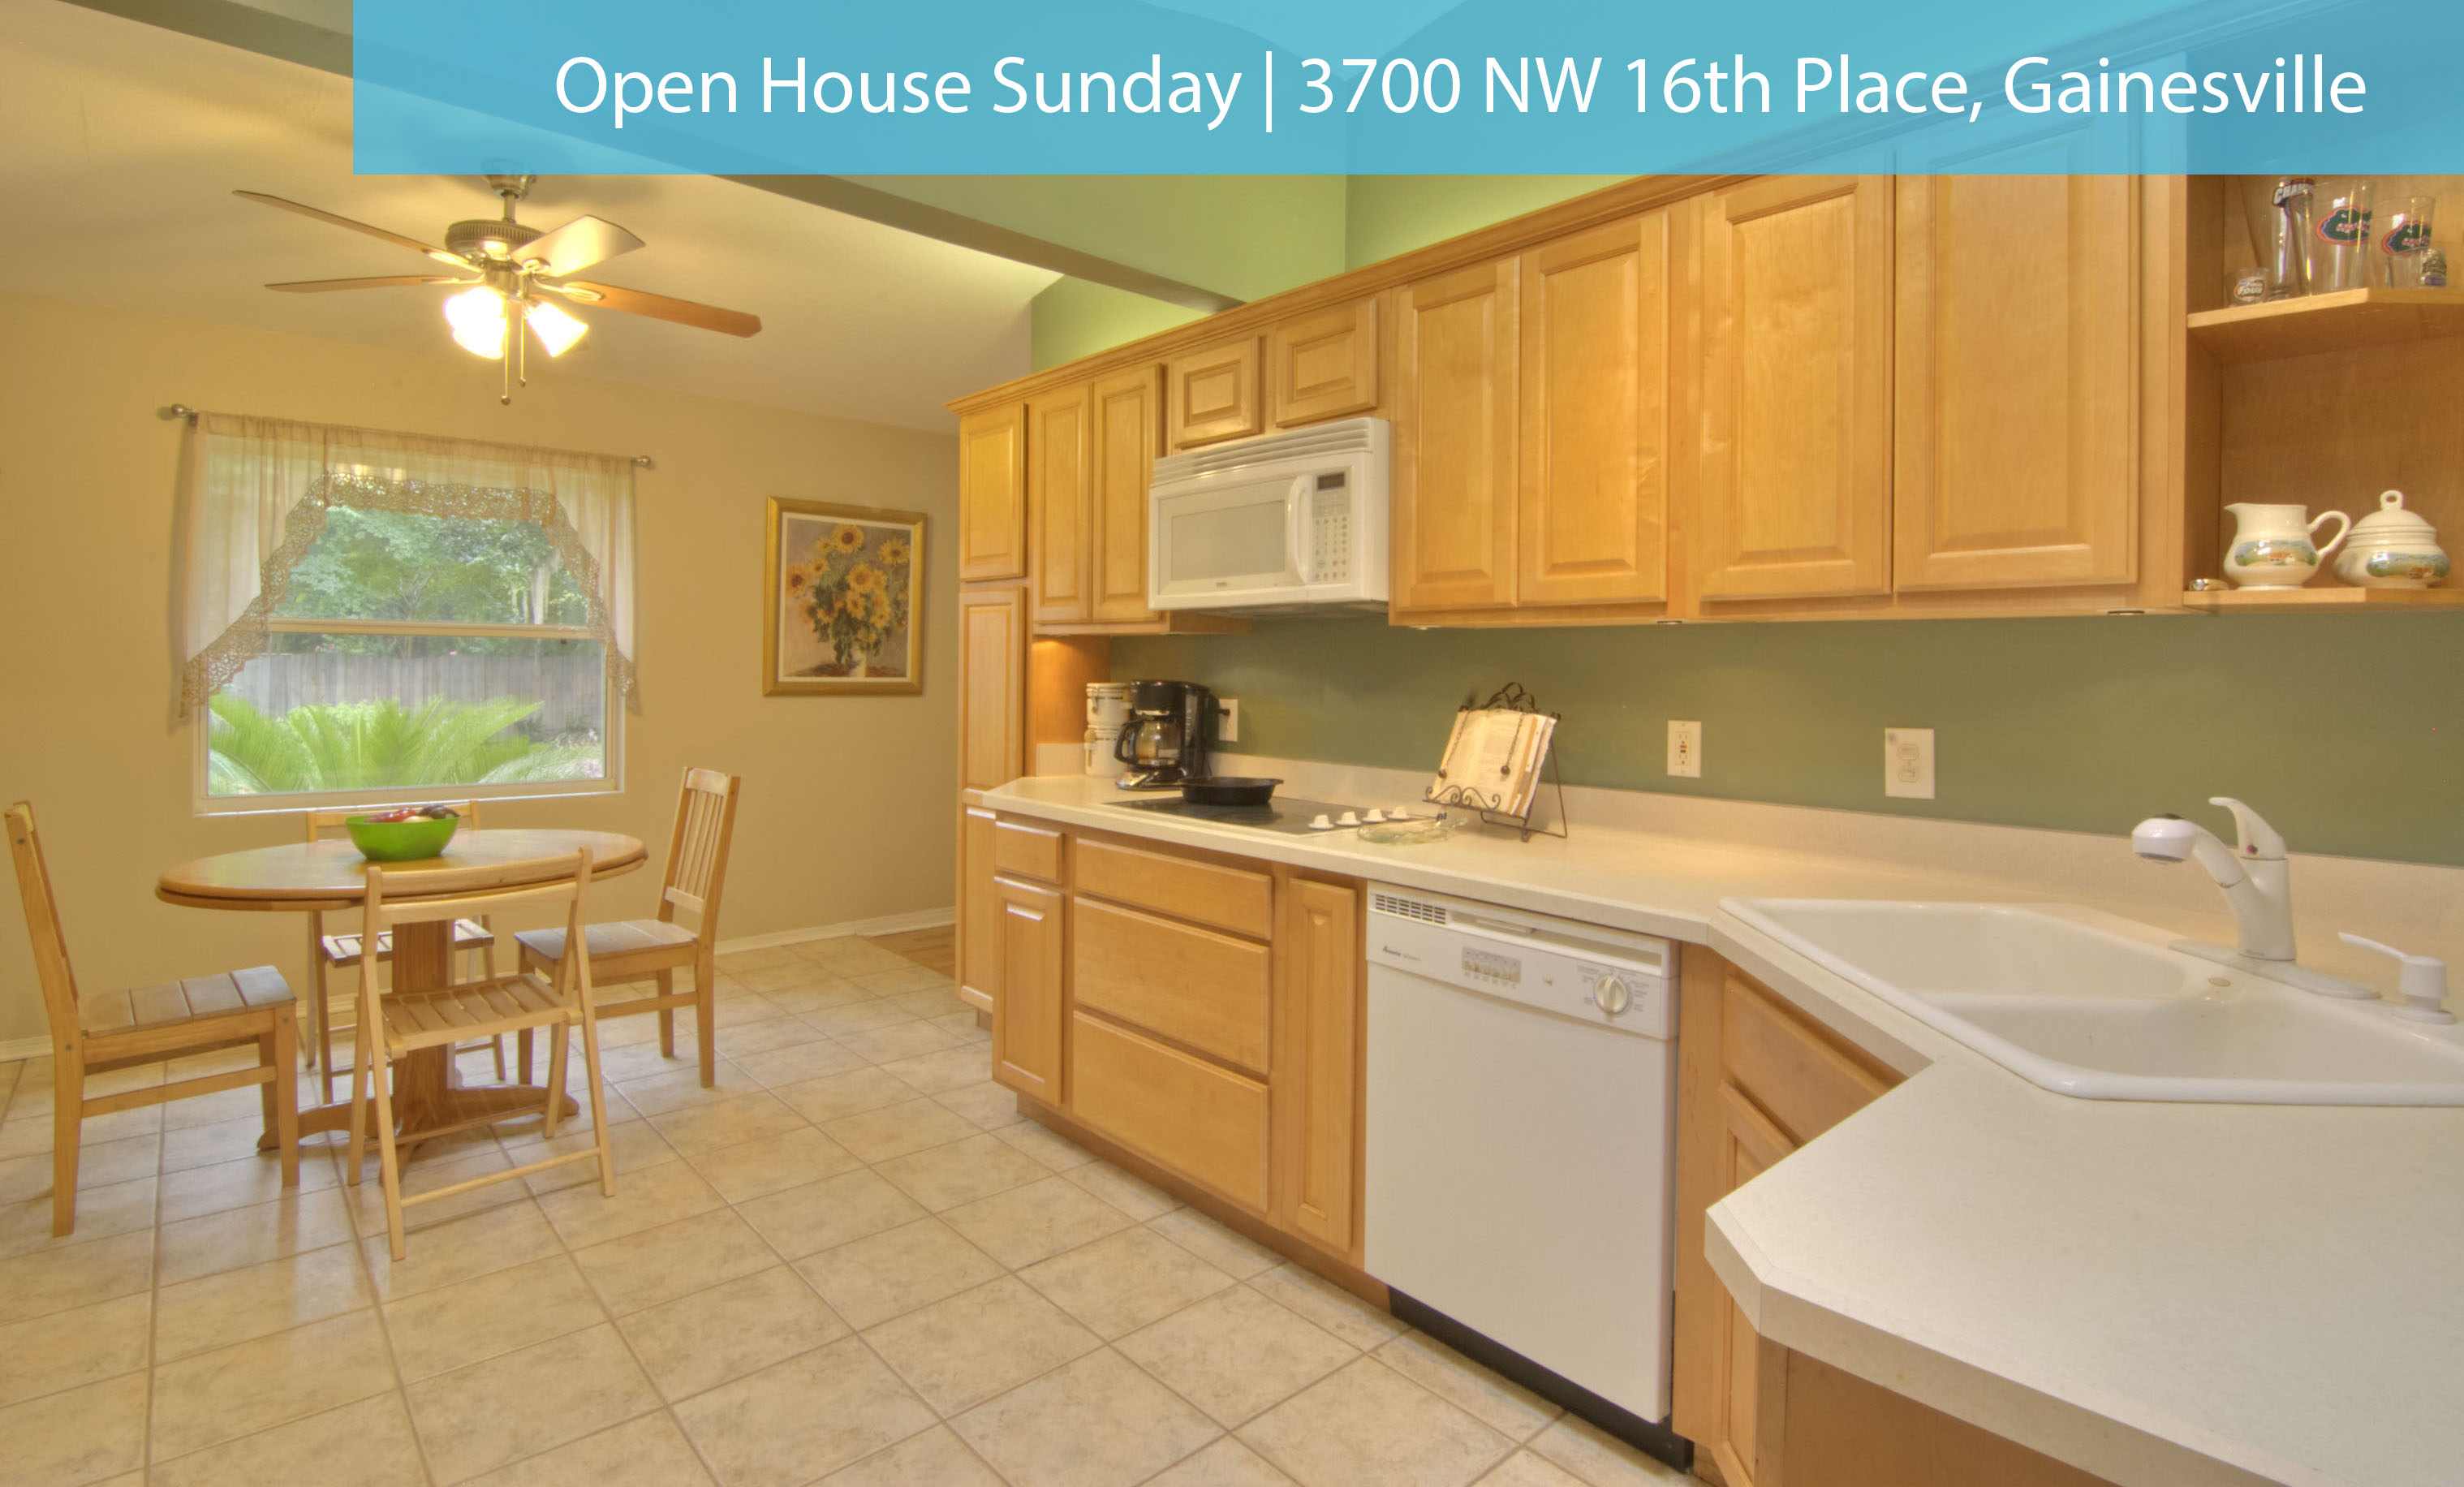 Open House: Sunday 9/28 2-4pm